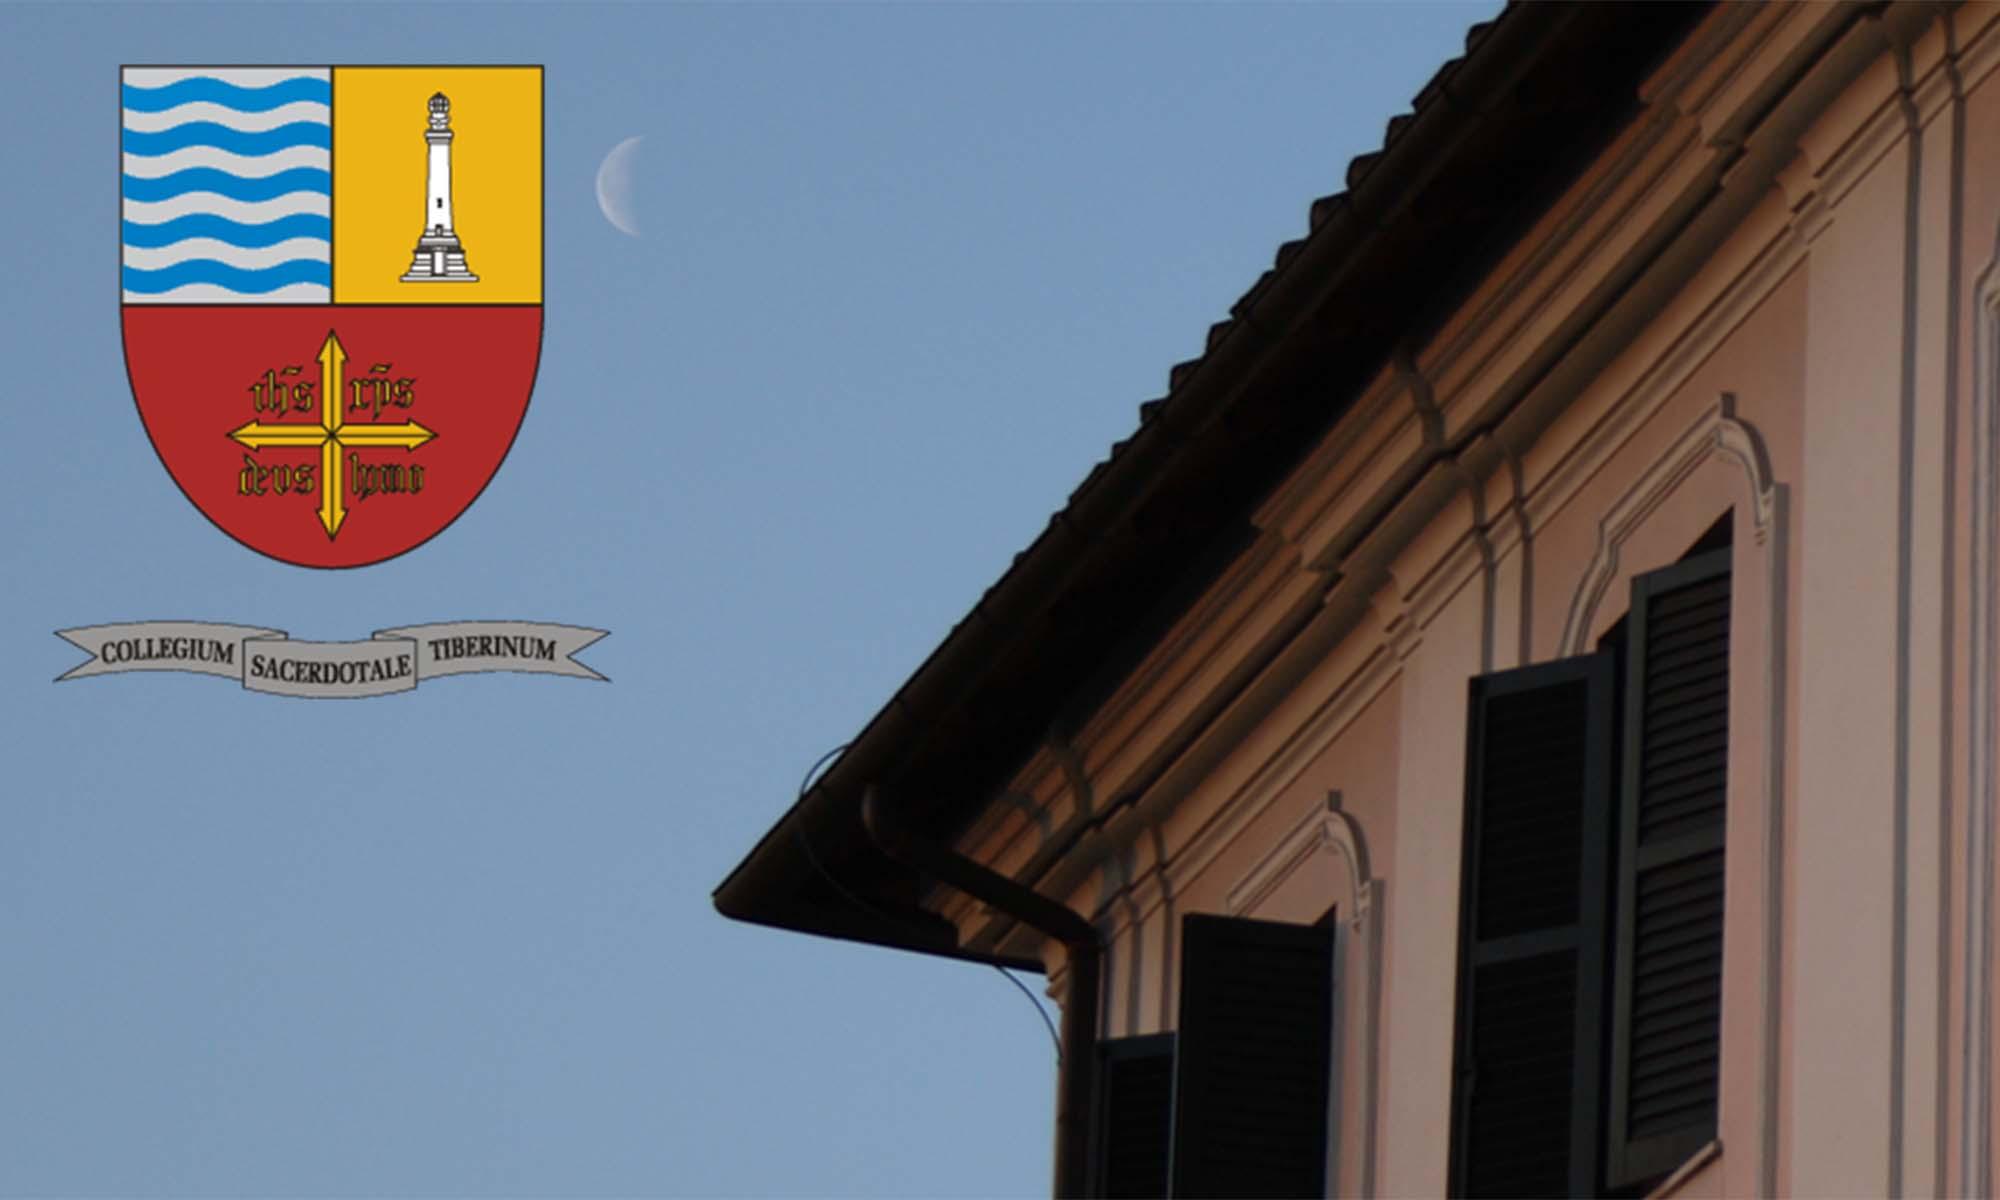 Collegio Sacerdotale Tiberino